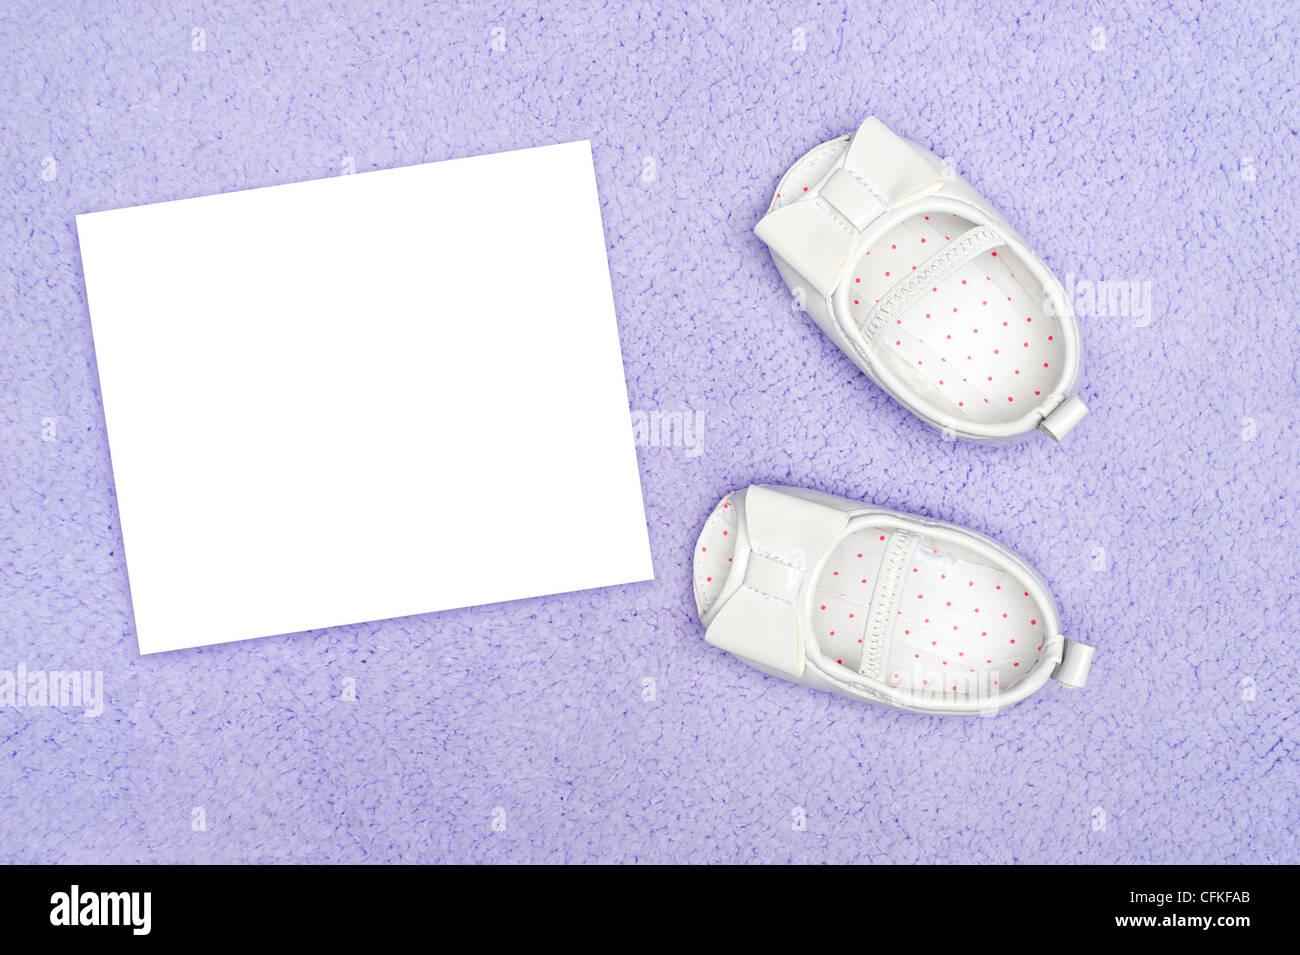 Invitation card formal blank stock photos invitation card formal formal infant dress shoes on purple carpet with blank white card for copy stock stopboris Choice Image